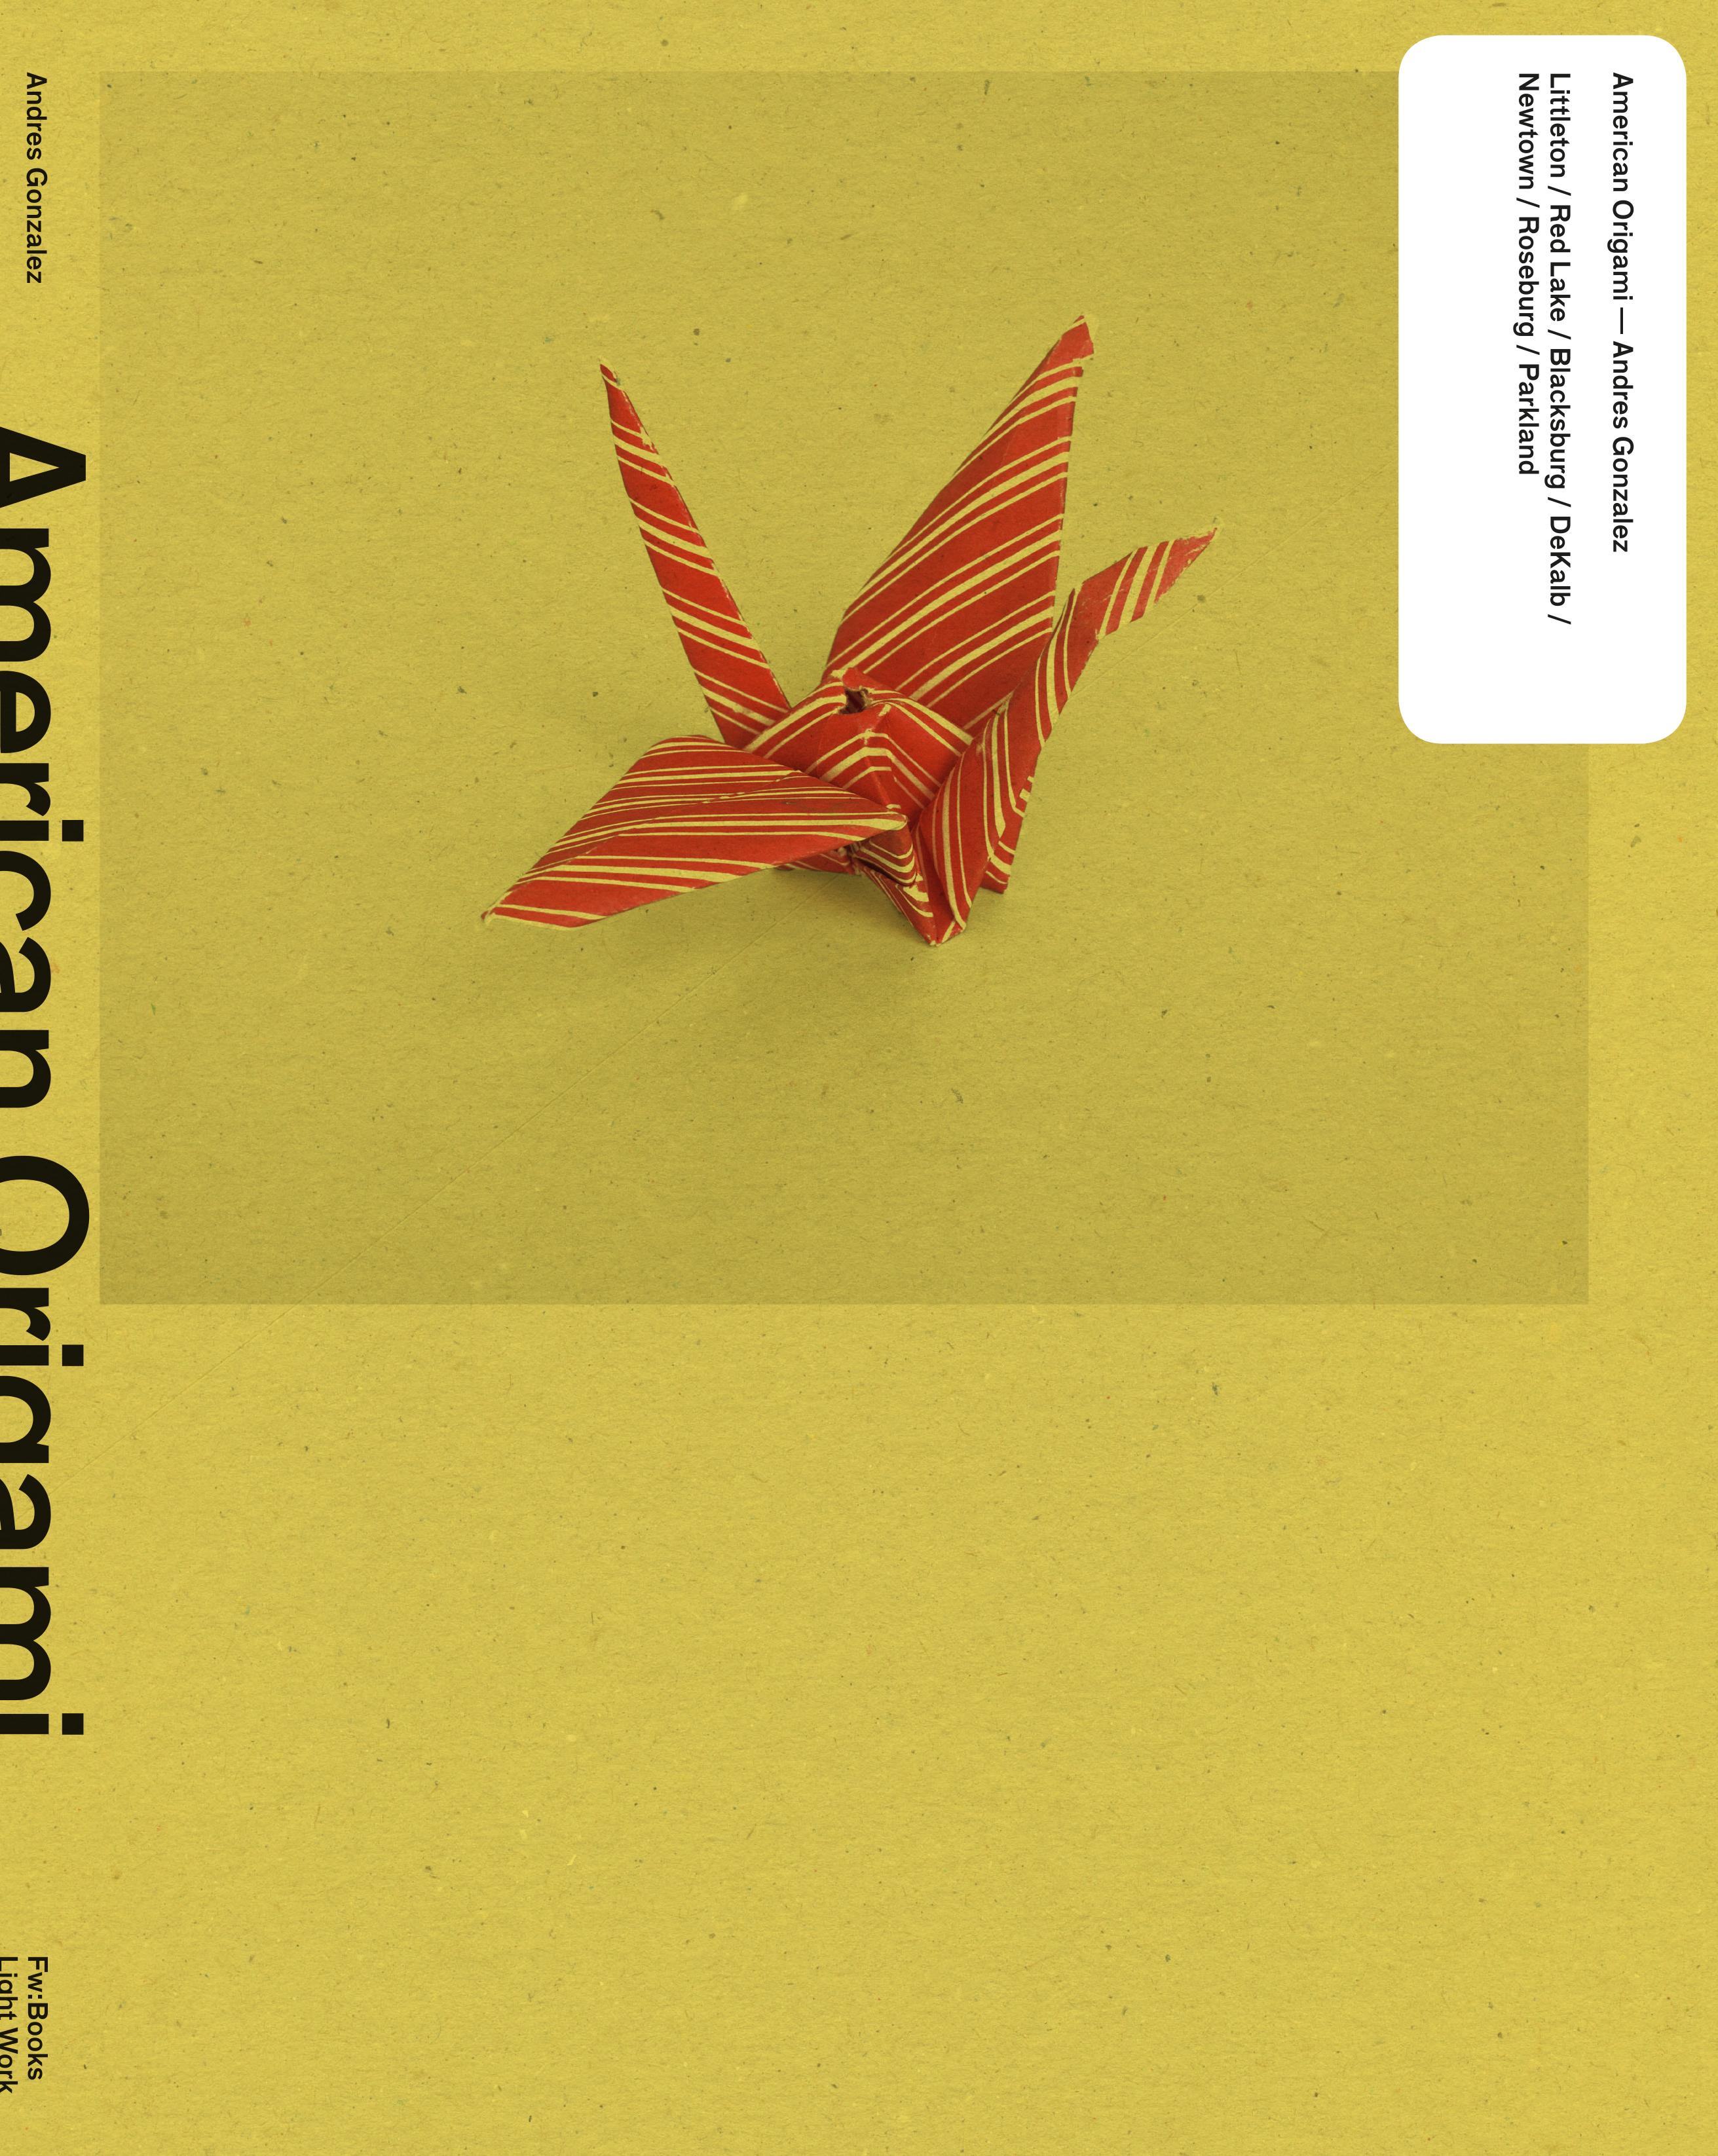 American Origami